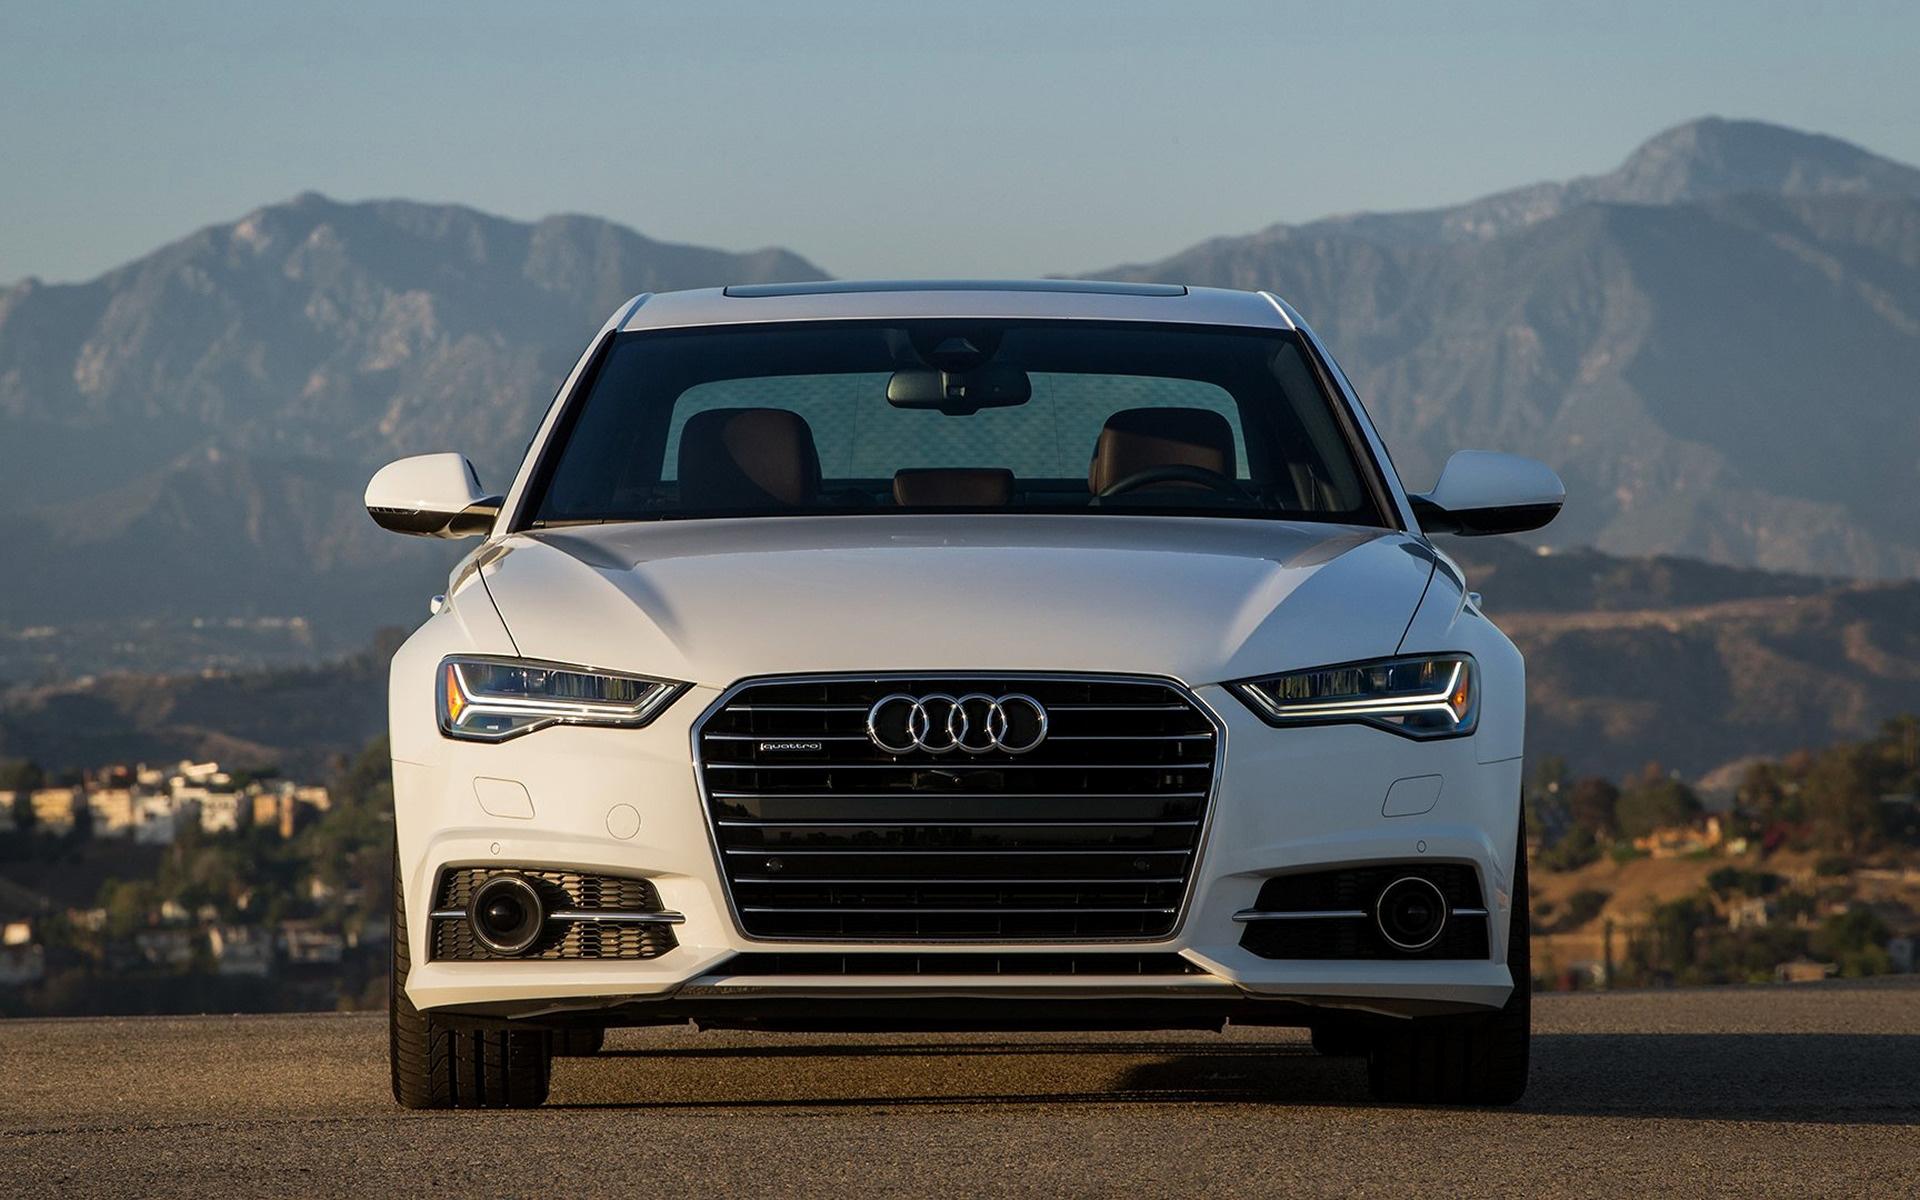 audi-a-sedan-Audi-A-Sedan-S-Line-Us-And-Hd-Images-for-Audi-A-Sedan-wallpaper-wp3602801